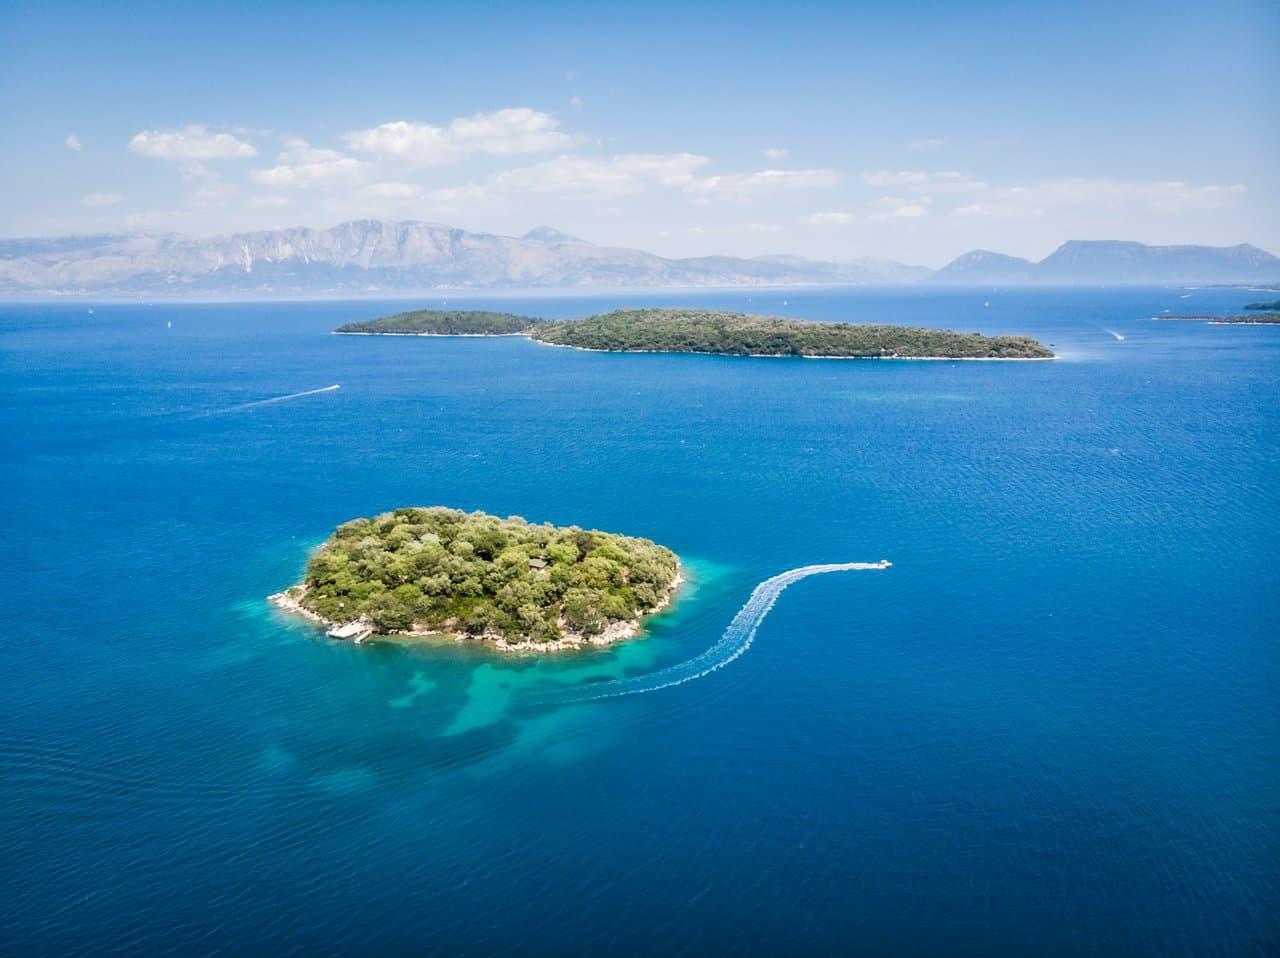 Kihnu island